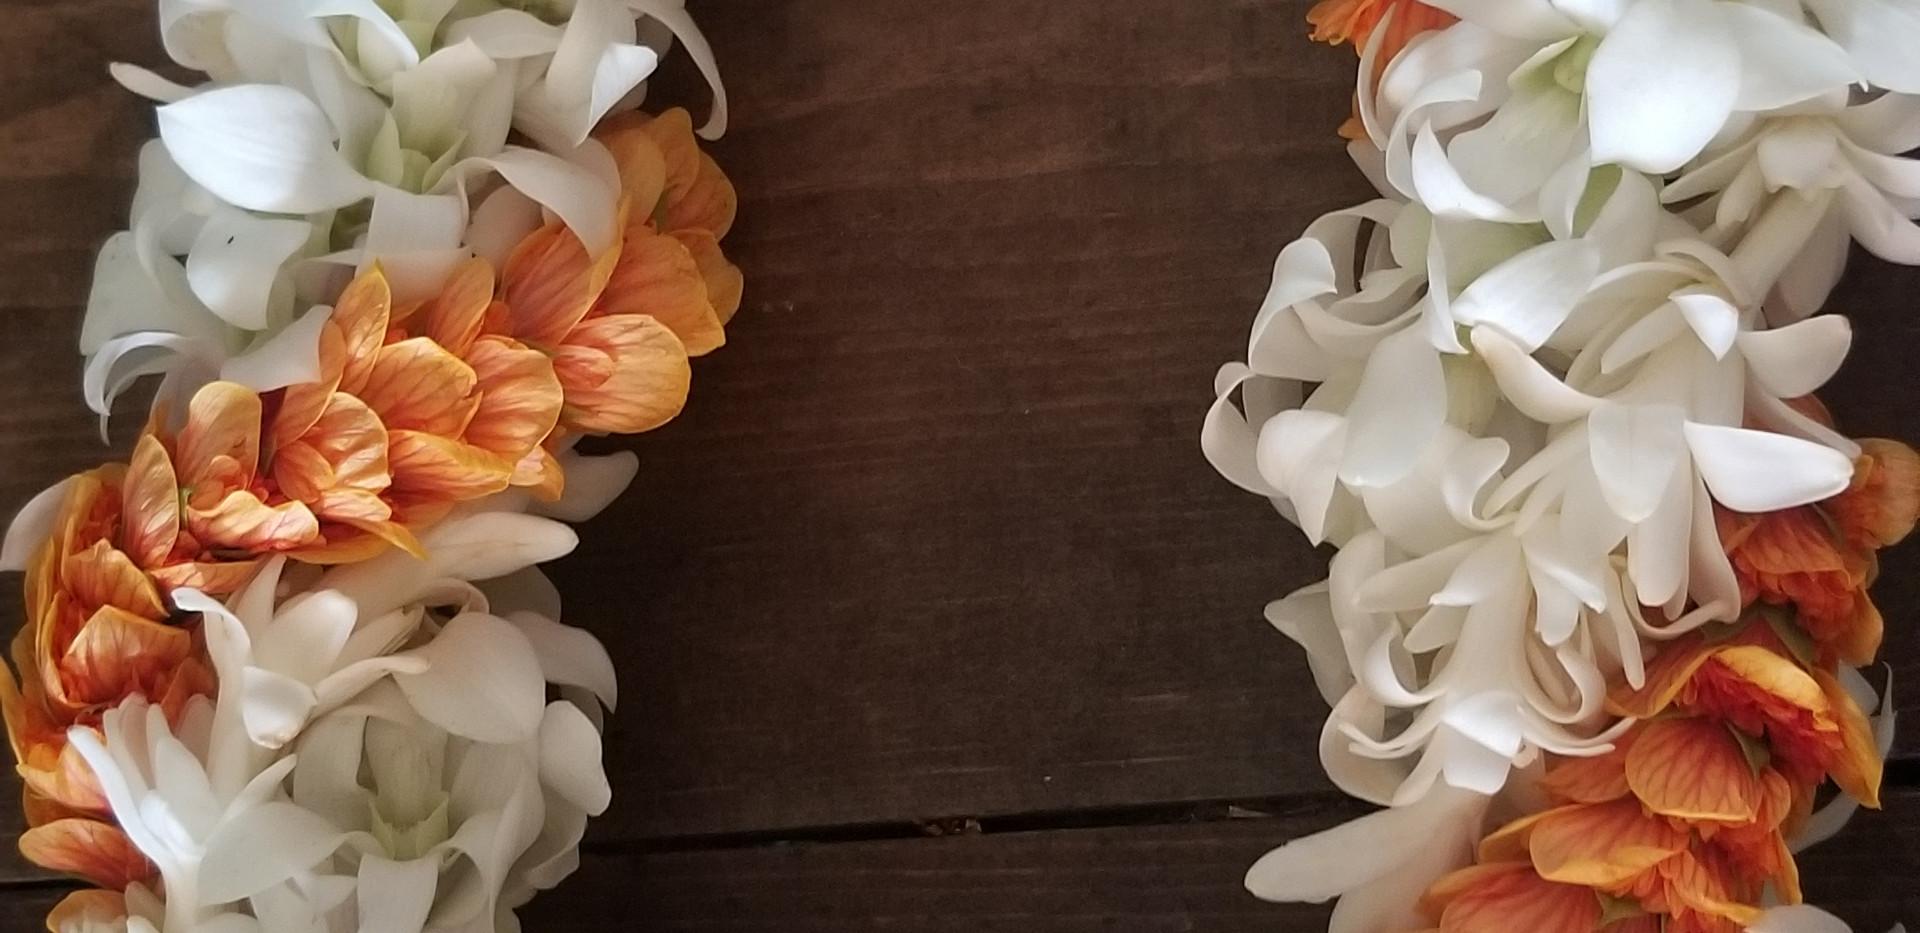 Triple twist orchid, tuberose and ilima lei